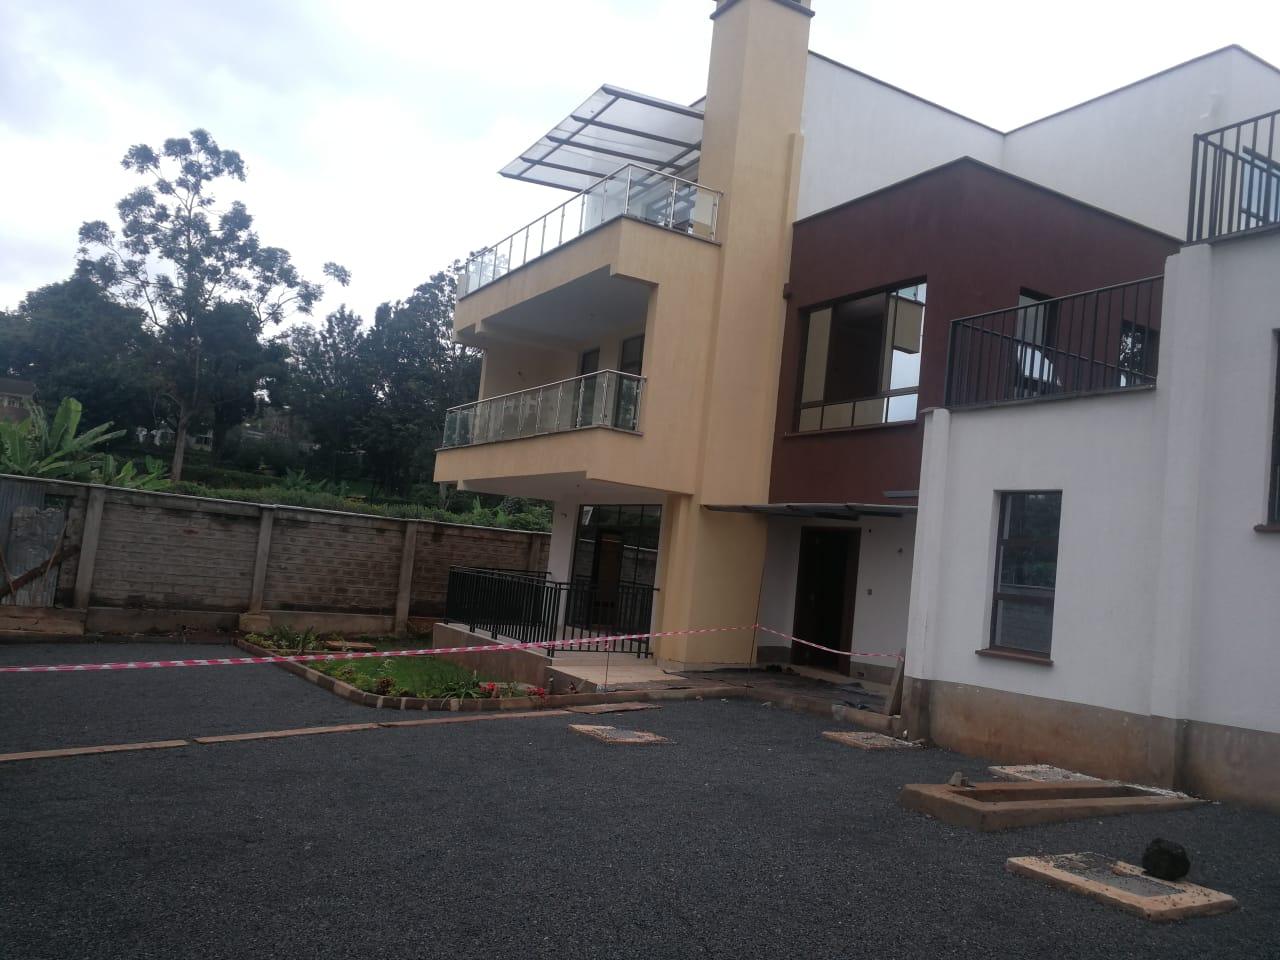 5 Bedroom all En-suite Townhouses for Sale in Kileleshwa, Nairobi